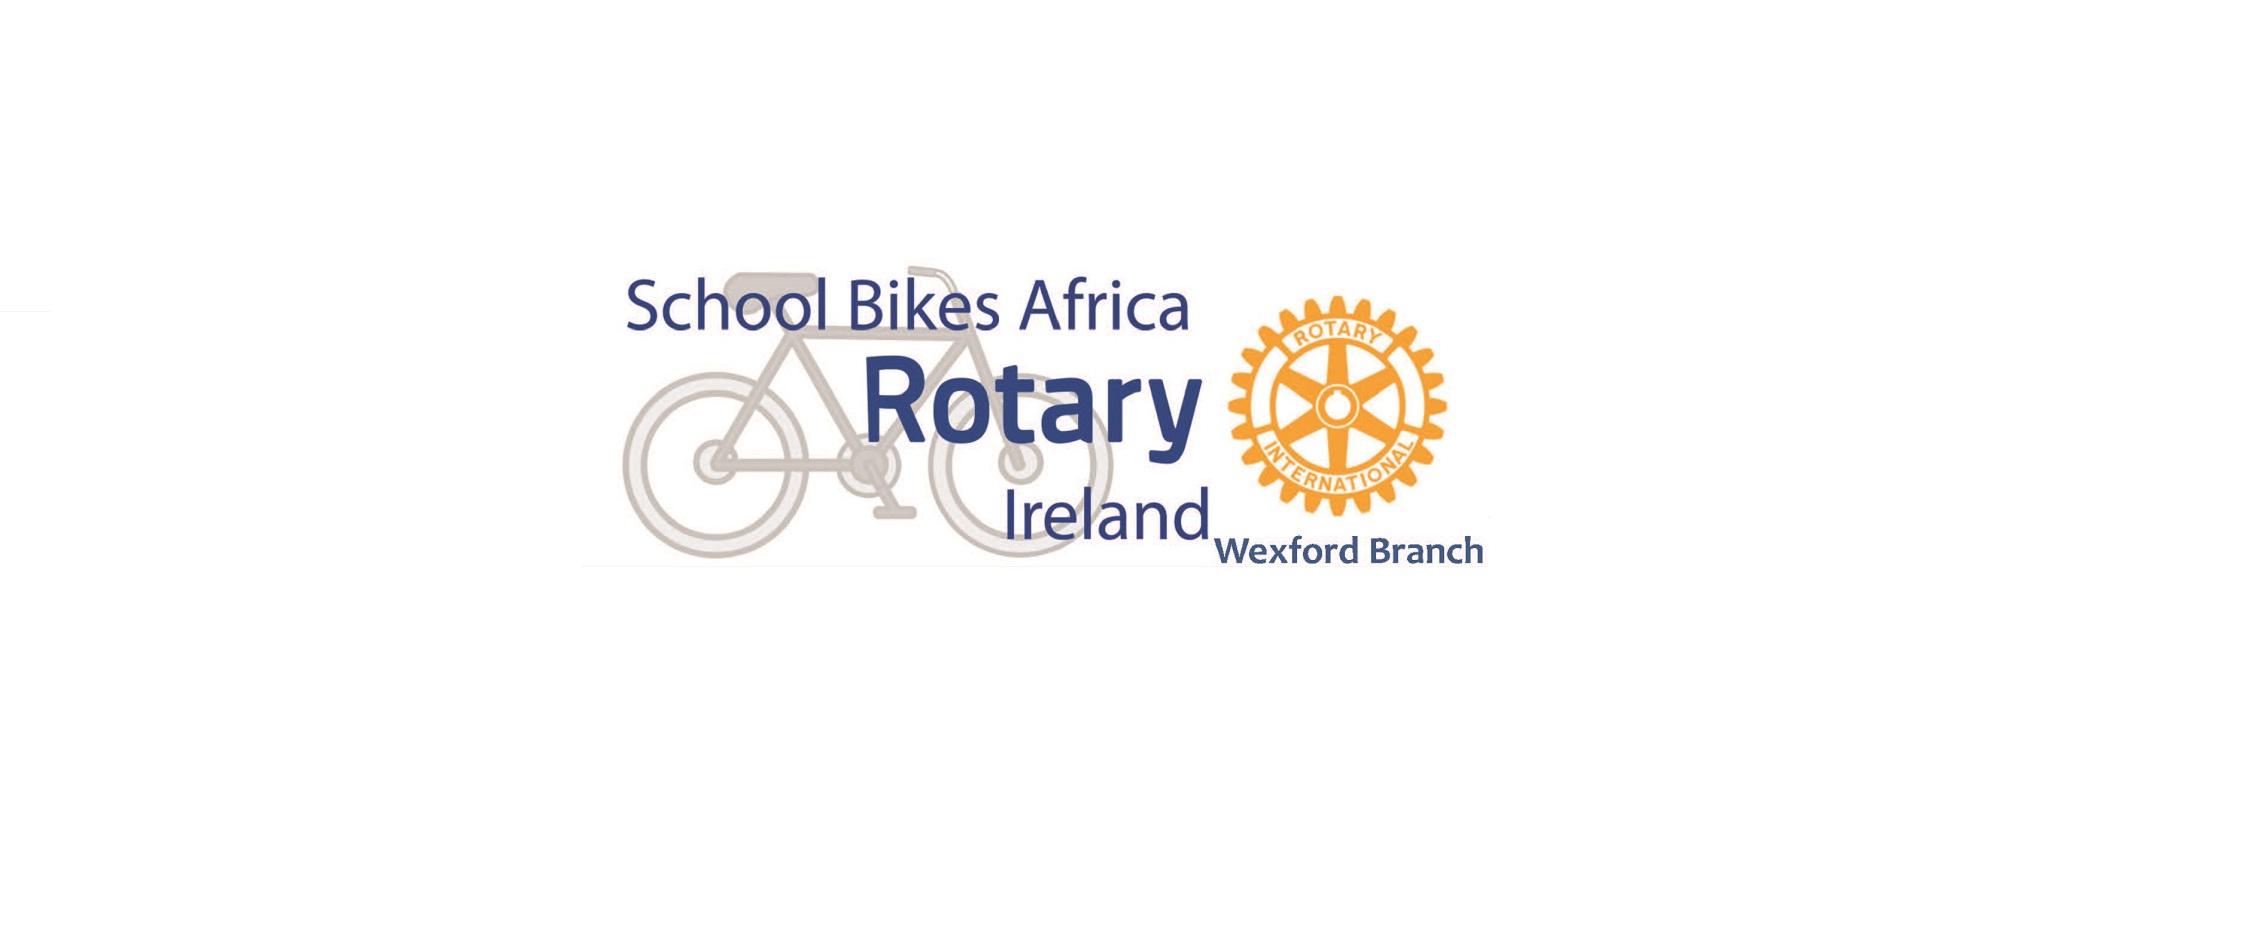 School-Bikes-Africa-Reuse-Month